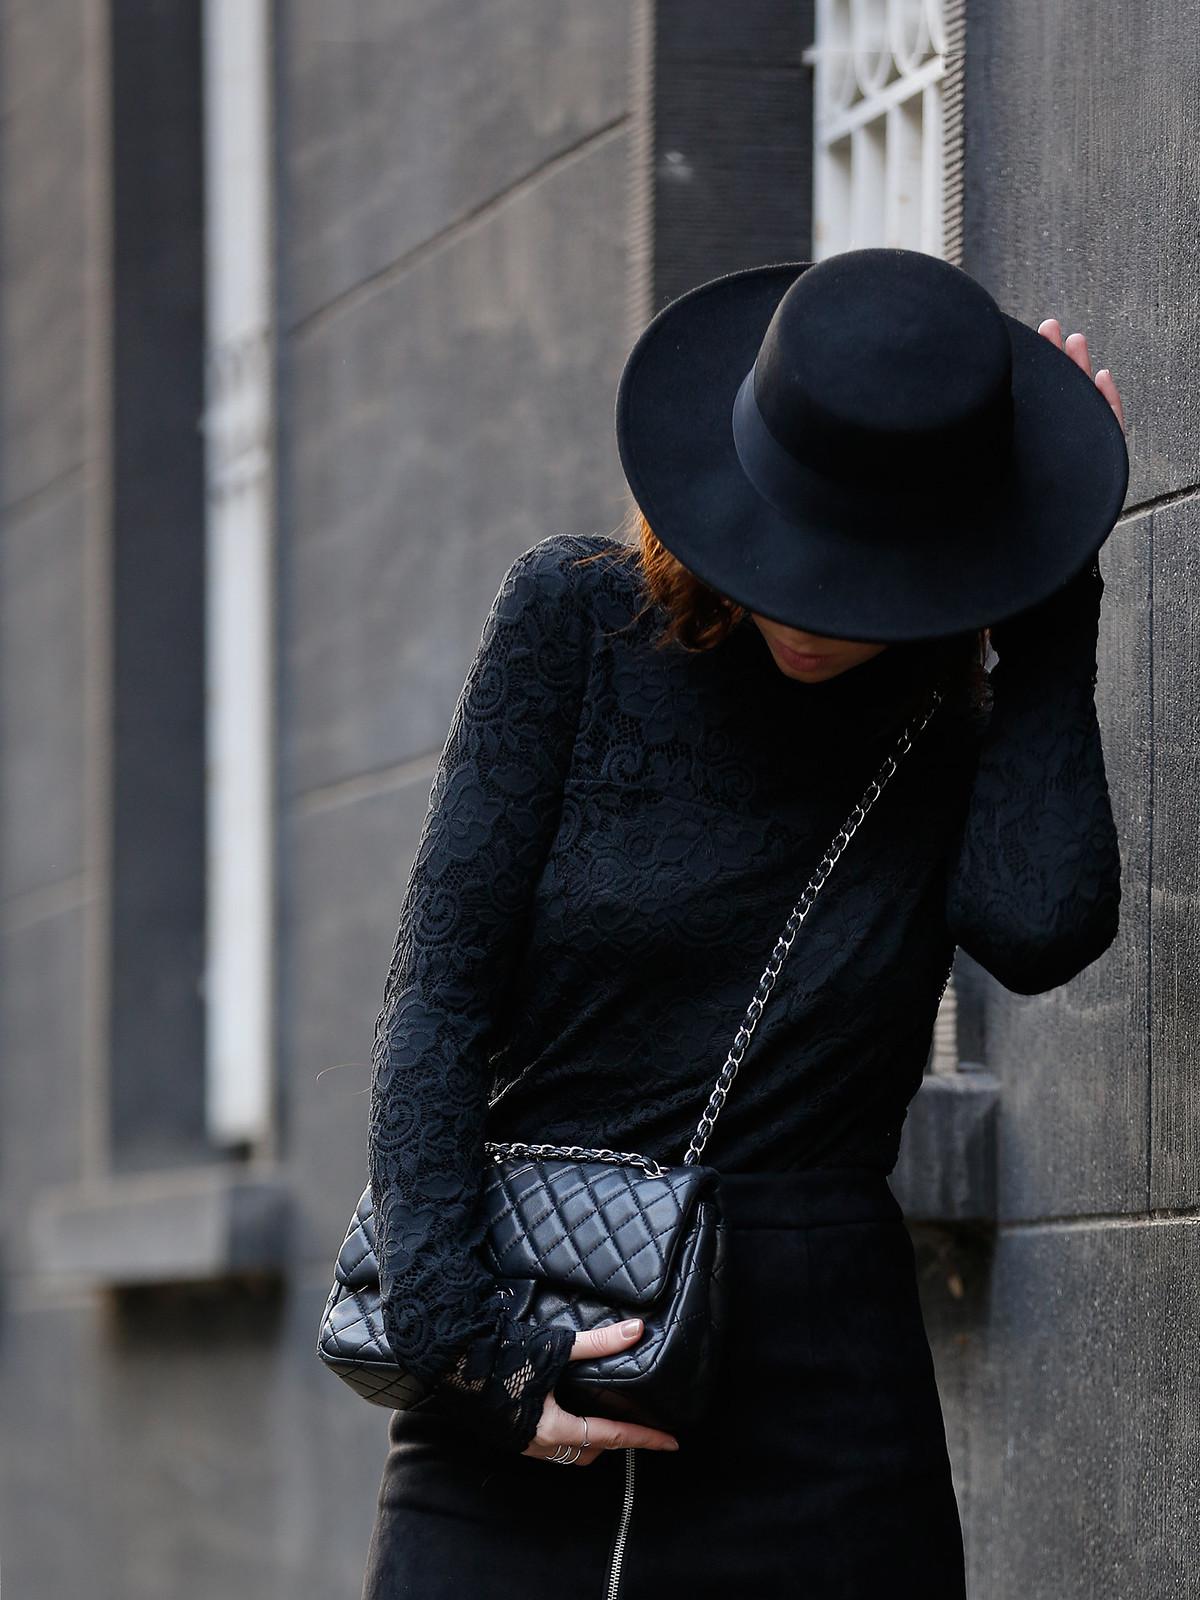 VILA lace layering black allblack hat spanish style dark romance fishnet tights chanel classic luxury bag fashionblogger ricarda schernus cats & dogs modeblog düsseldorf berlin minimal edgy cool styling lookbook ootd 1